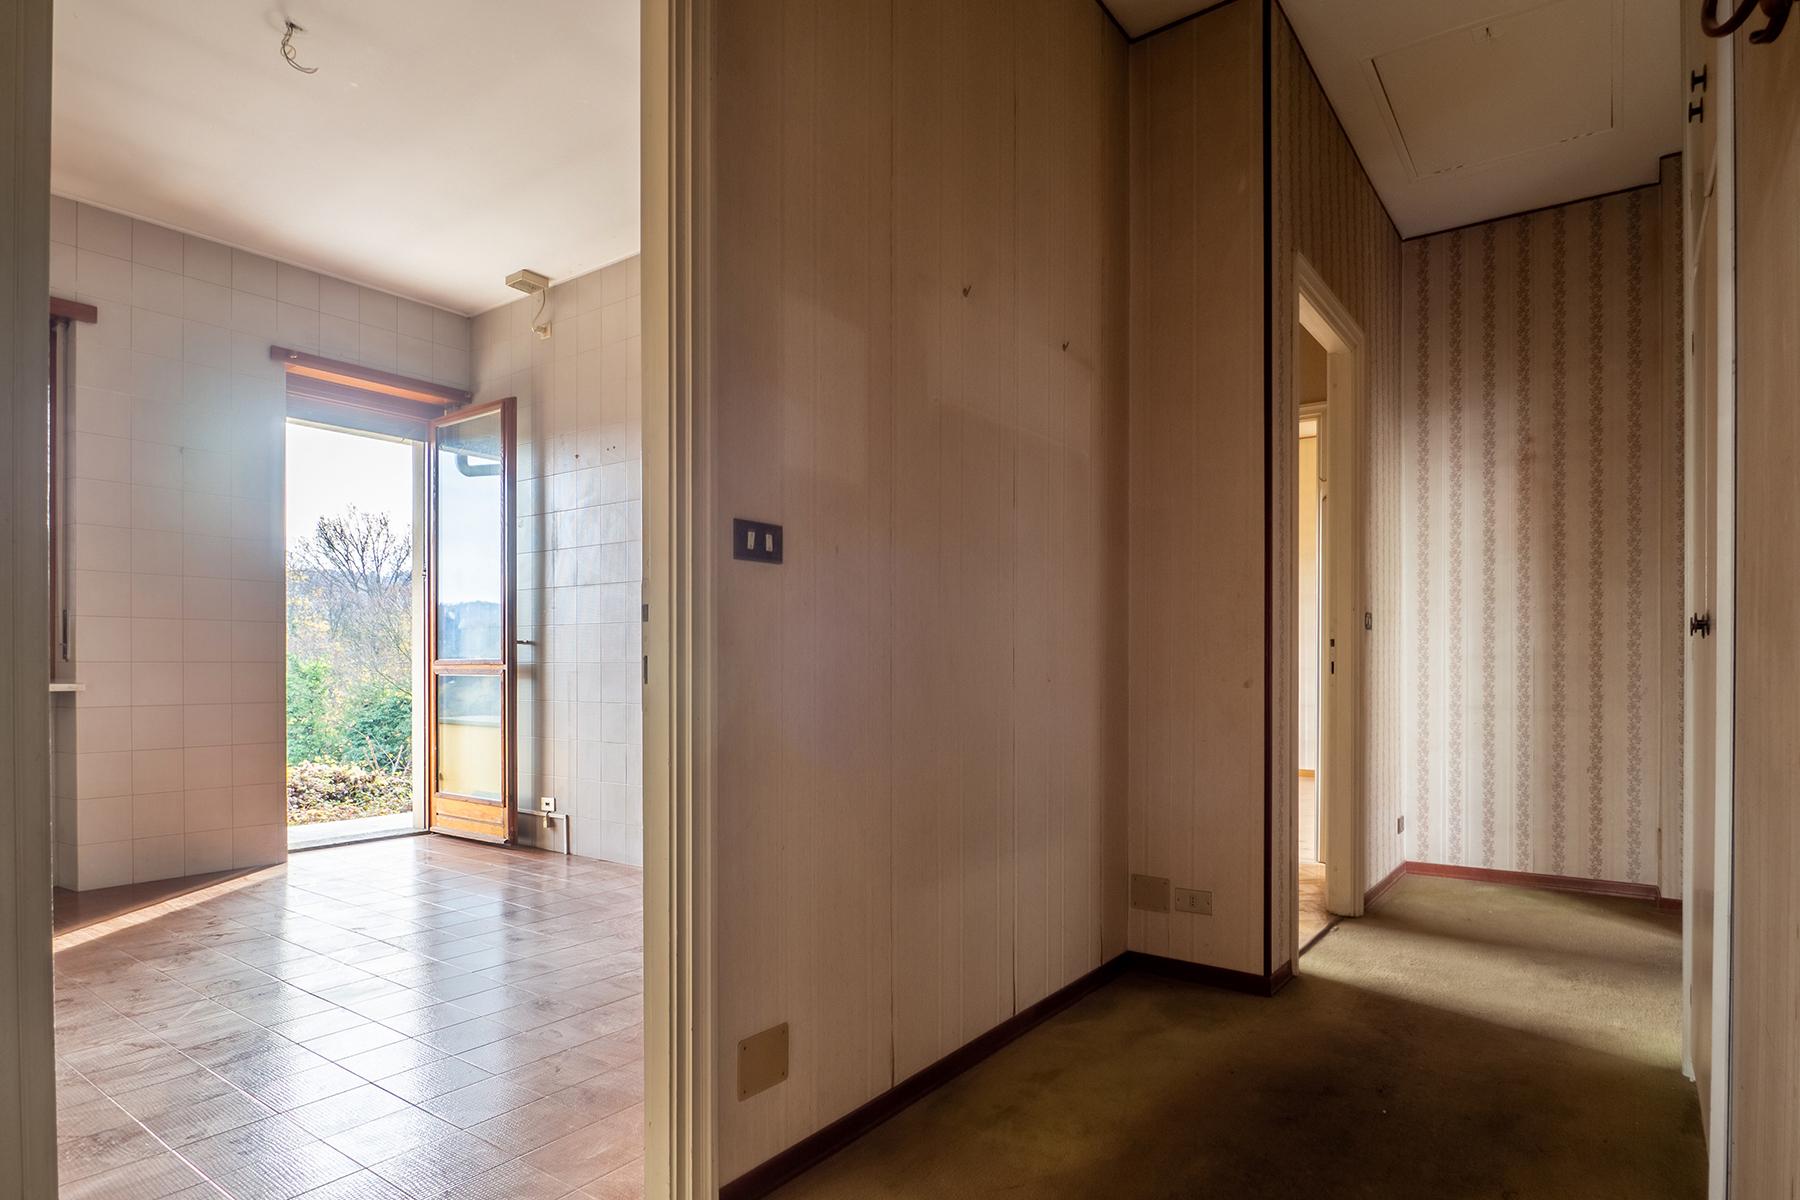 Casa indipendente in Vendita a Torino: 5 locali, 277 mq - Foto 14